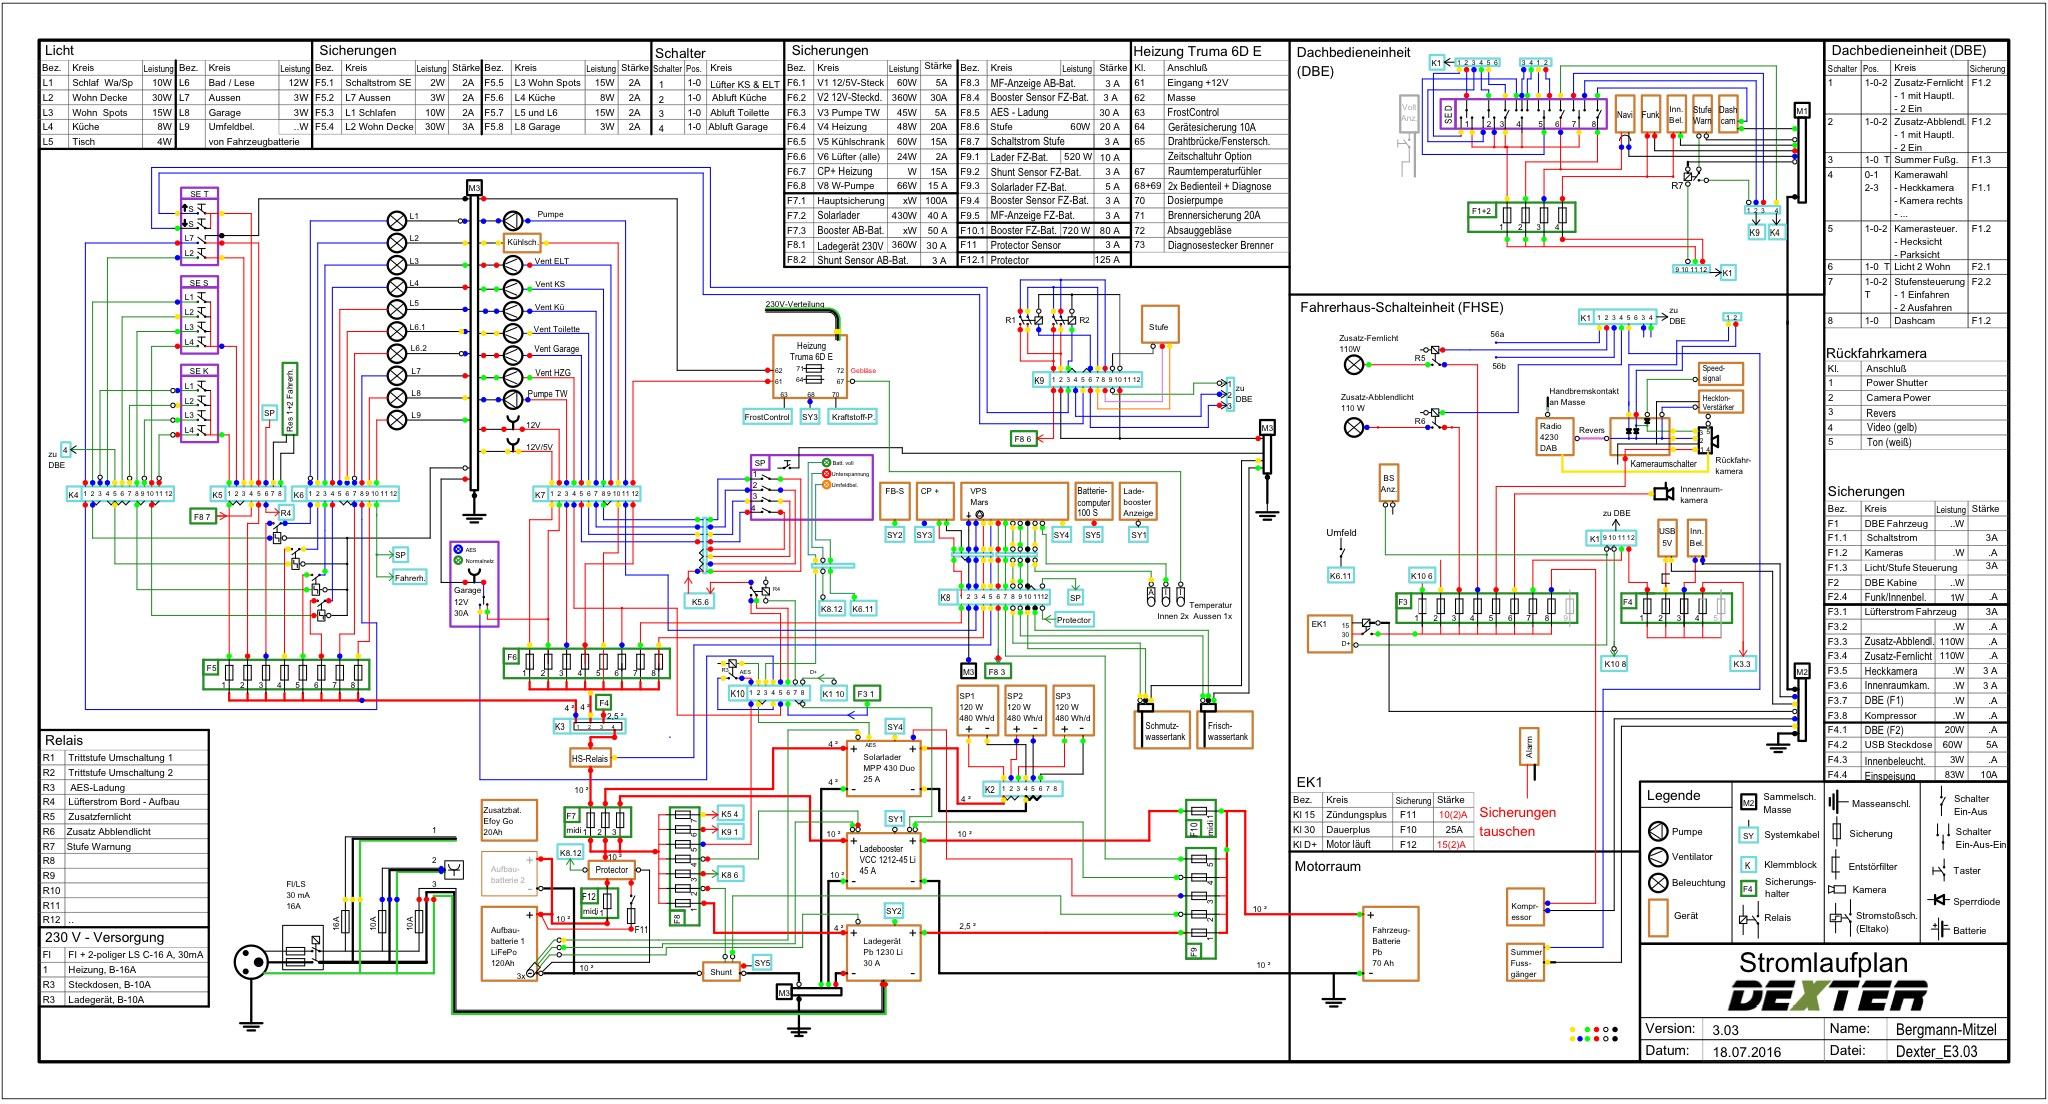 Dexter Wire Diagram Schematics Wiring Axle Schematic Auto Electrical Aircraft Diagrams